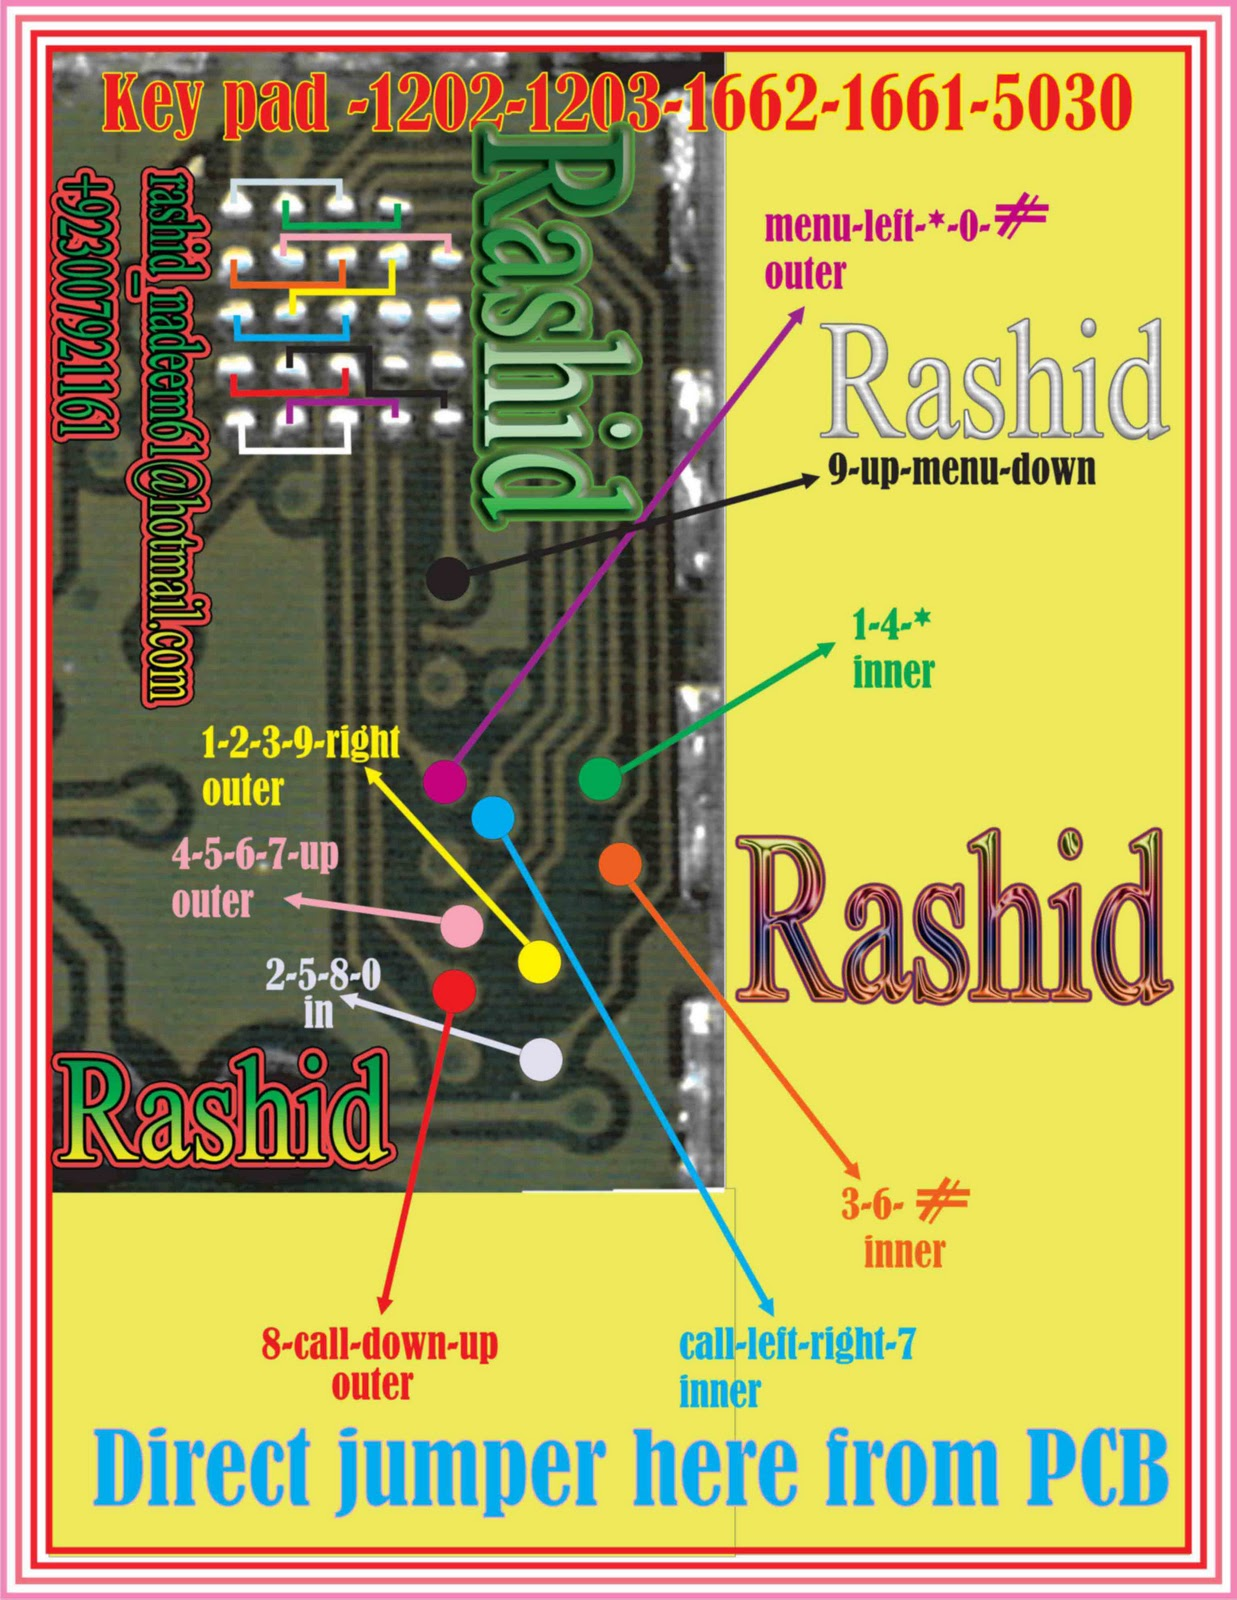 http://1.bp.blogspot.com/_9Z7dTG7H9HQ/TOOqfLktEwI/AAAAAAAAADE/_apx2TfjjF0/s1600/keypad-1202-1203-1661-1662-5030.jpg